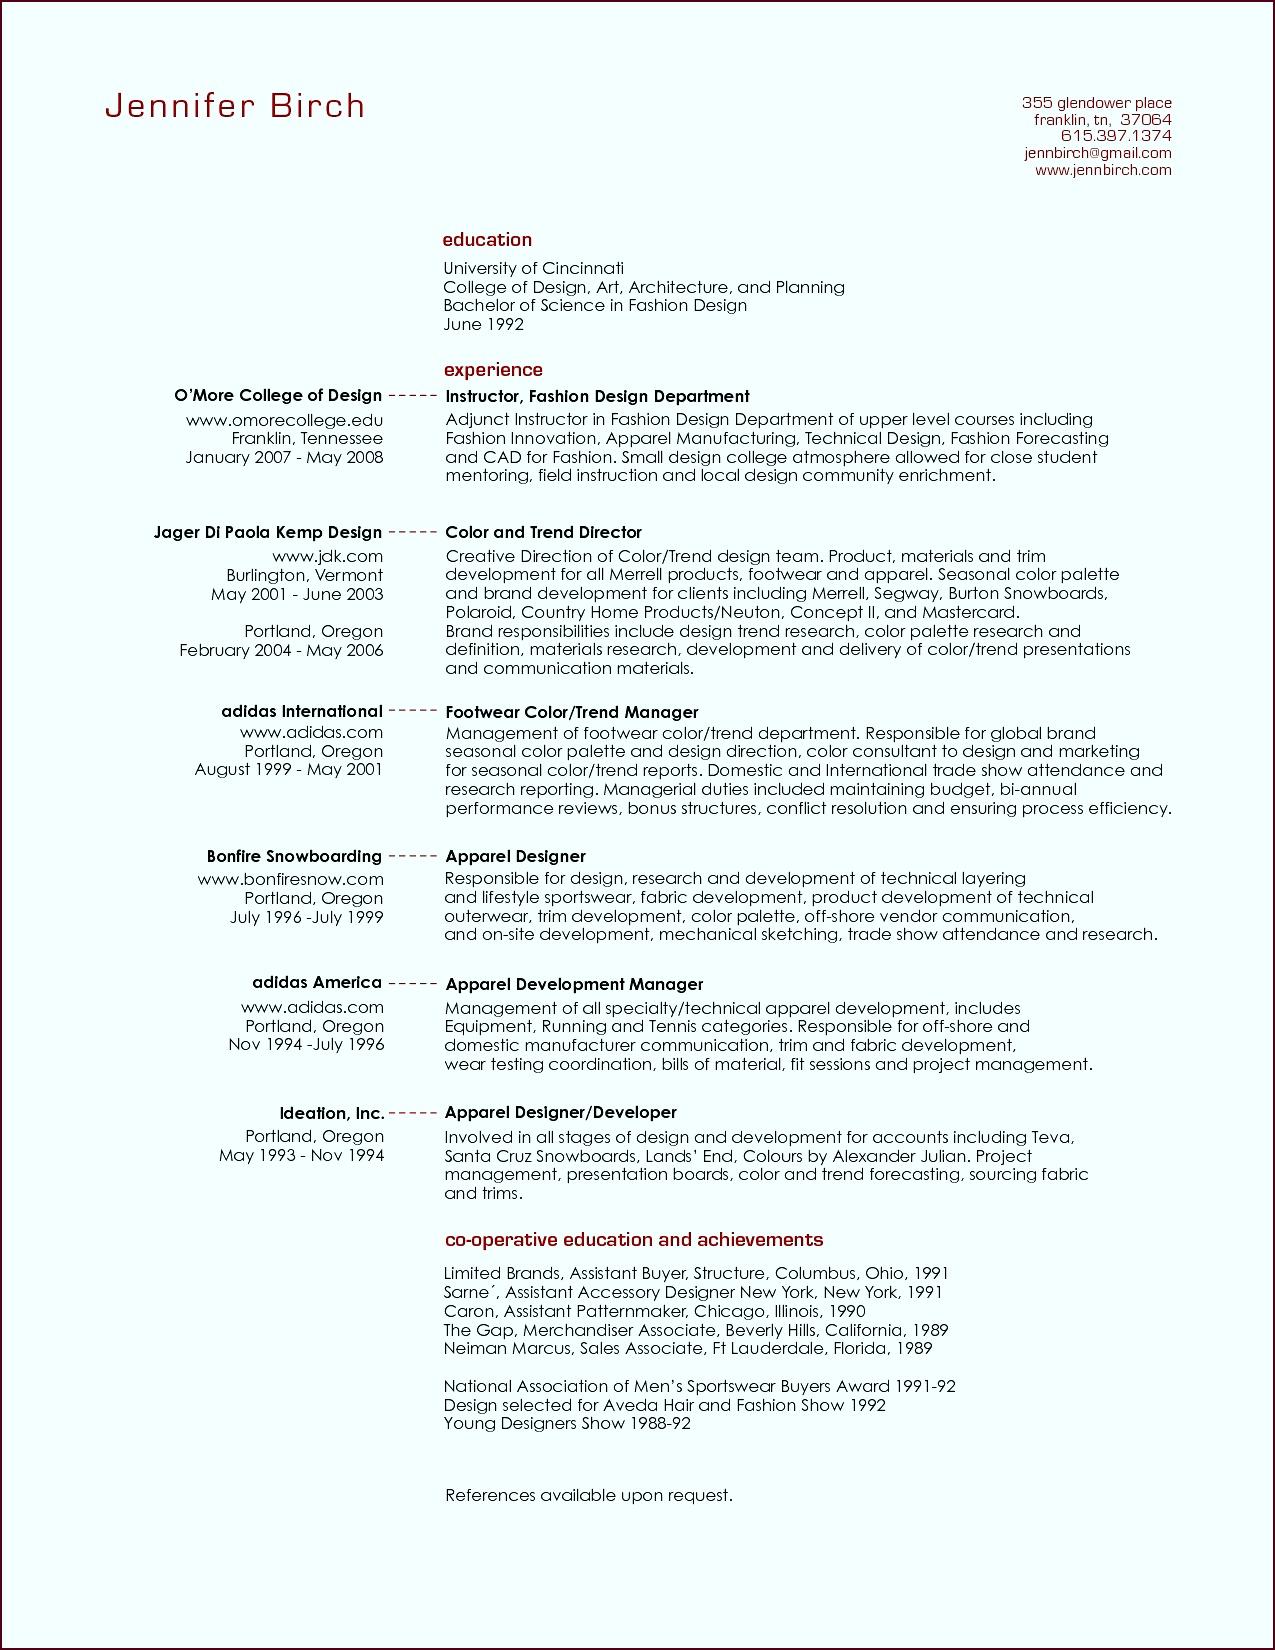 vendor-letter-template-1 Vendor Contact Request Letter Template on quote request letter template, vendor rejection letter, vendor cancellation letter sample, vendor letter of recommendation template, vendor termination letter template, vendor contract letter template, requisition request letter template, vendor letter of interest template, vendor purchase order template, vendor solicitation letter sample, vendor termination of services letter, request letter format template, vendor application form template, wedding vendor contract template, vendor risk assessment template, billing statement template, vendor invitation letter, vendor fair flyer template, vendor notification letter template, vendor information request form template,